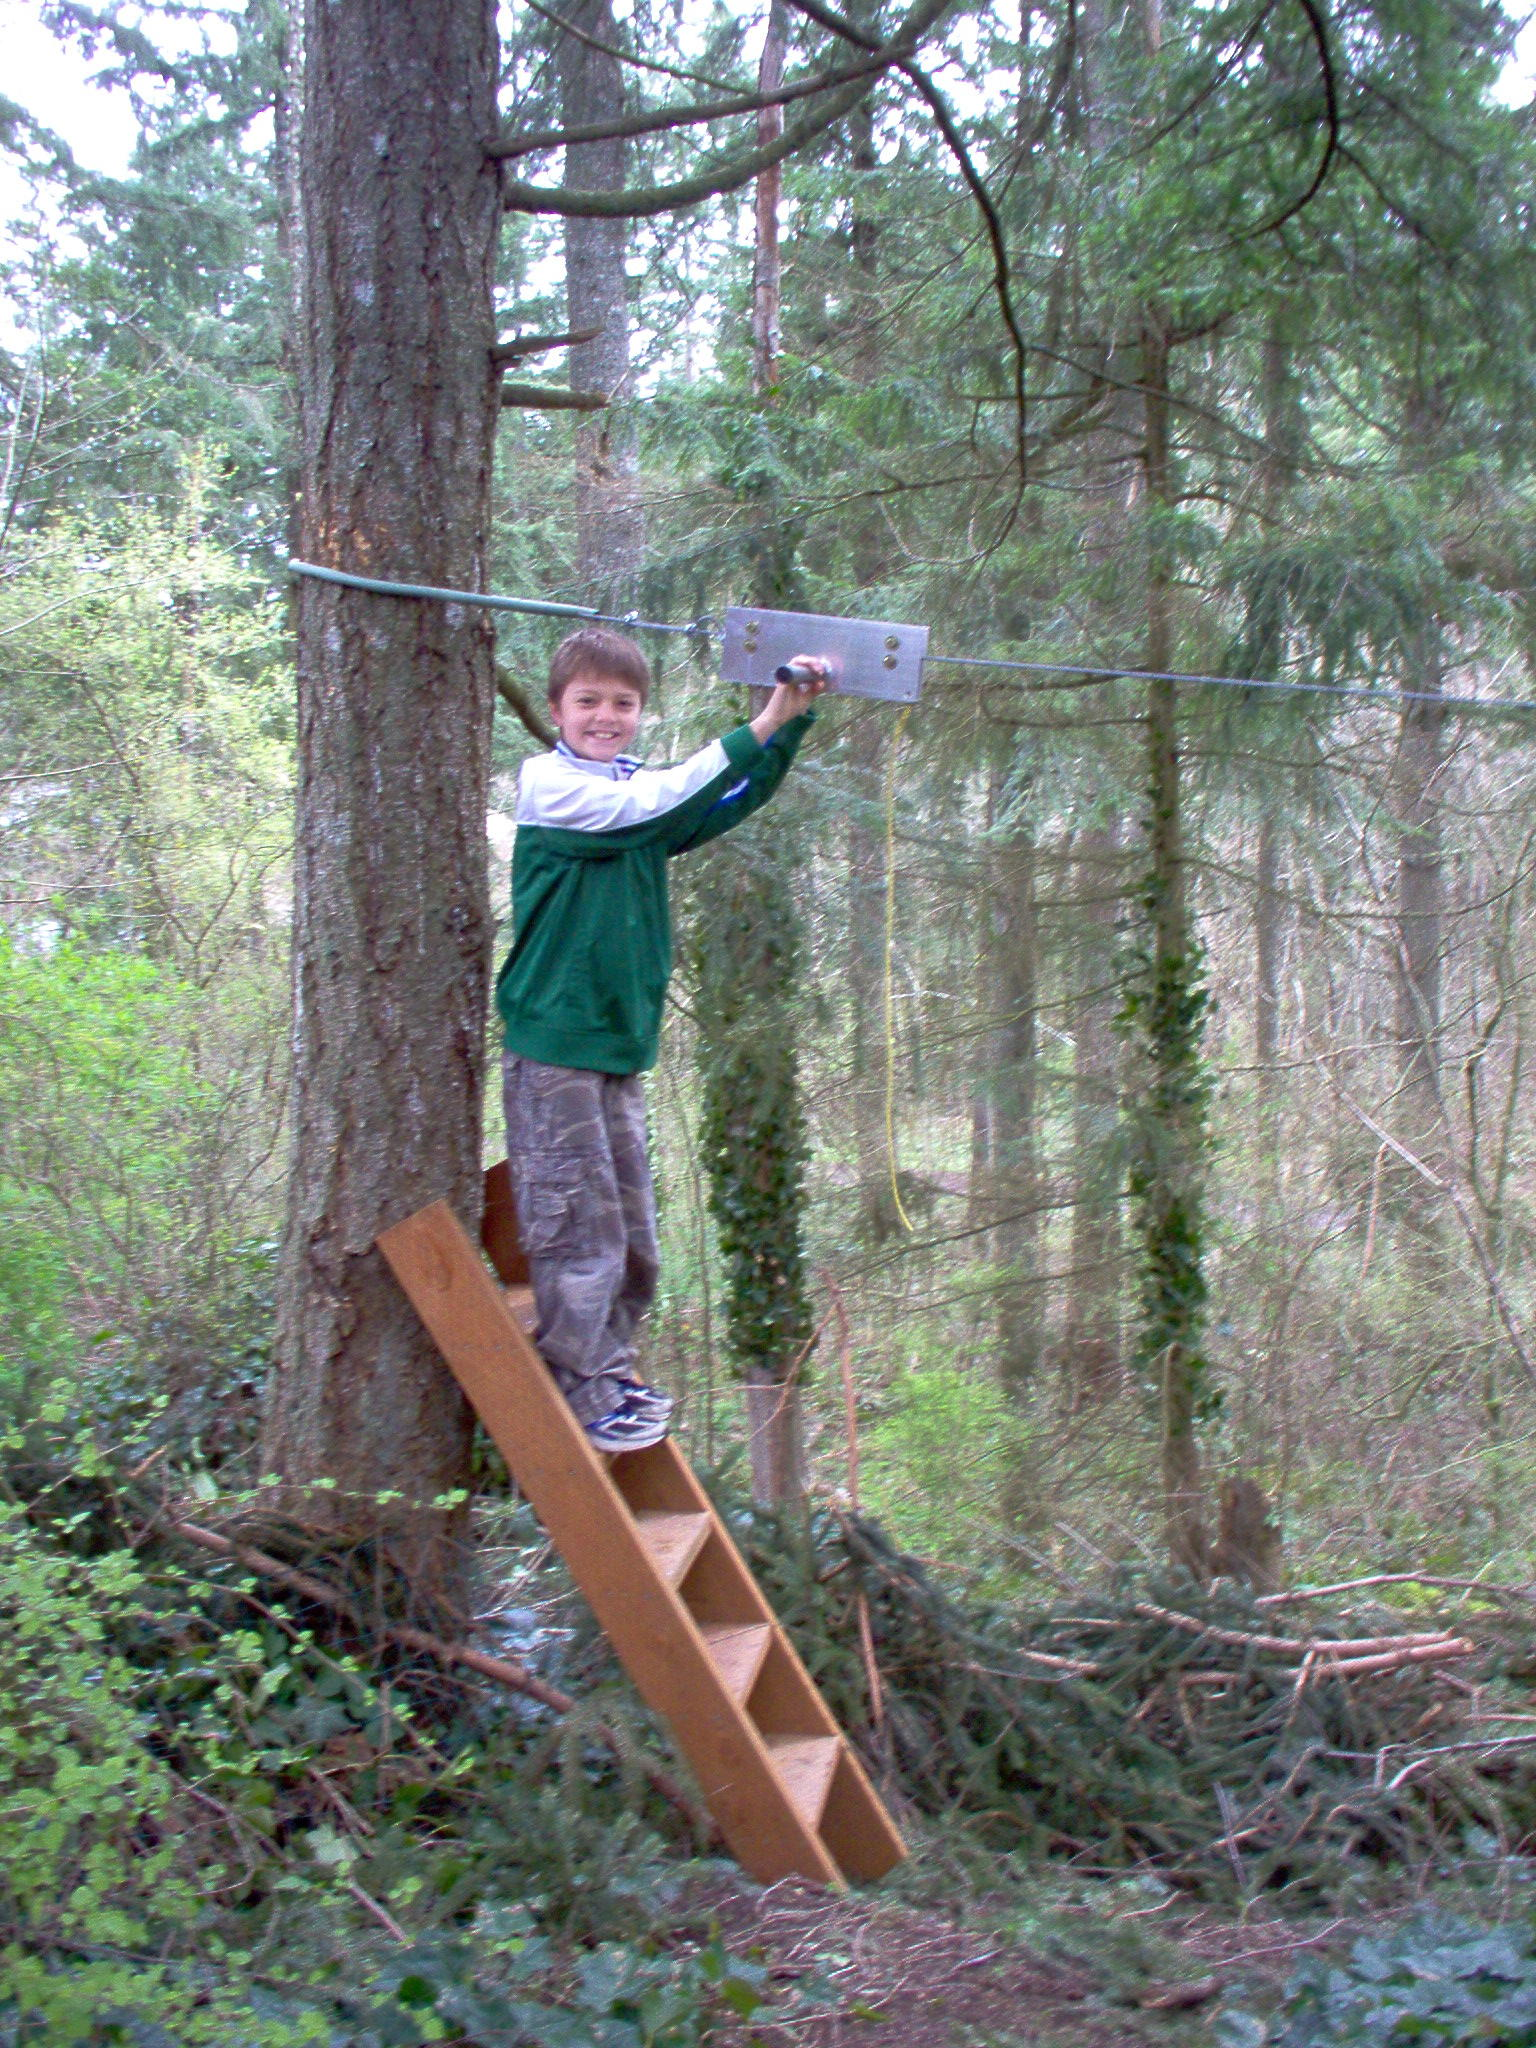 125 ft D&D Flyer Zip Line Kit, Cable Ride for Backyard ...